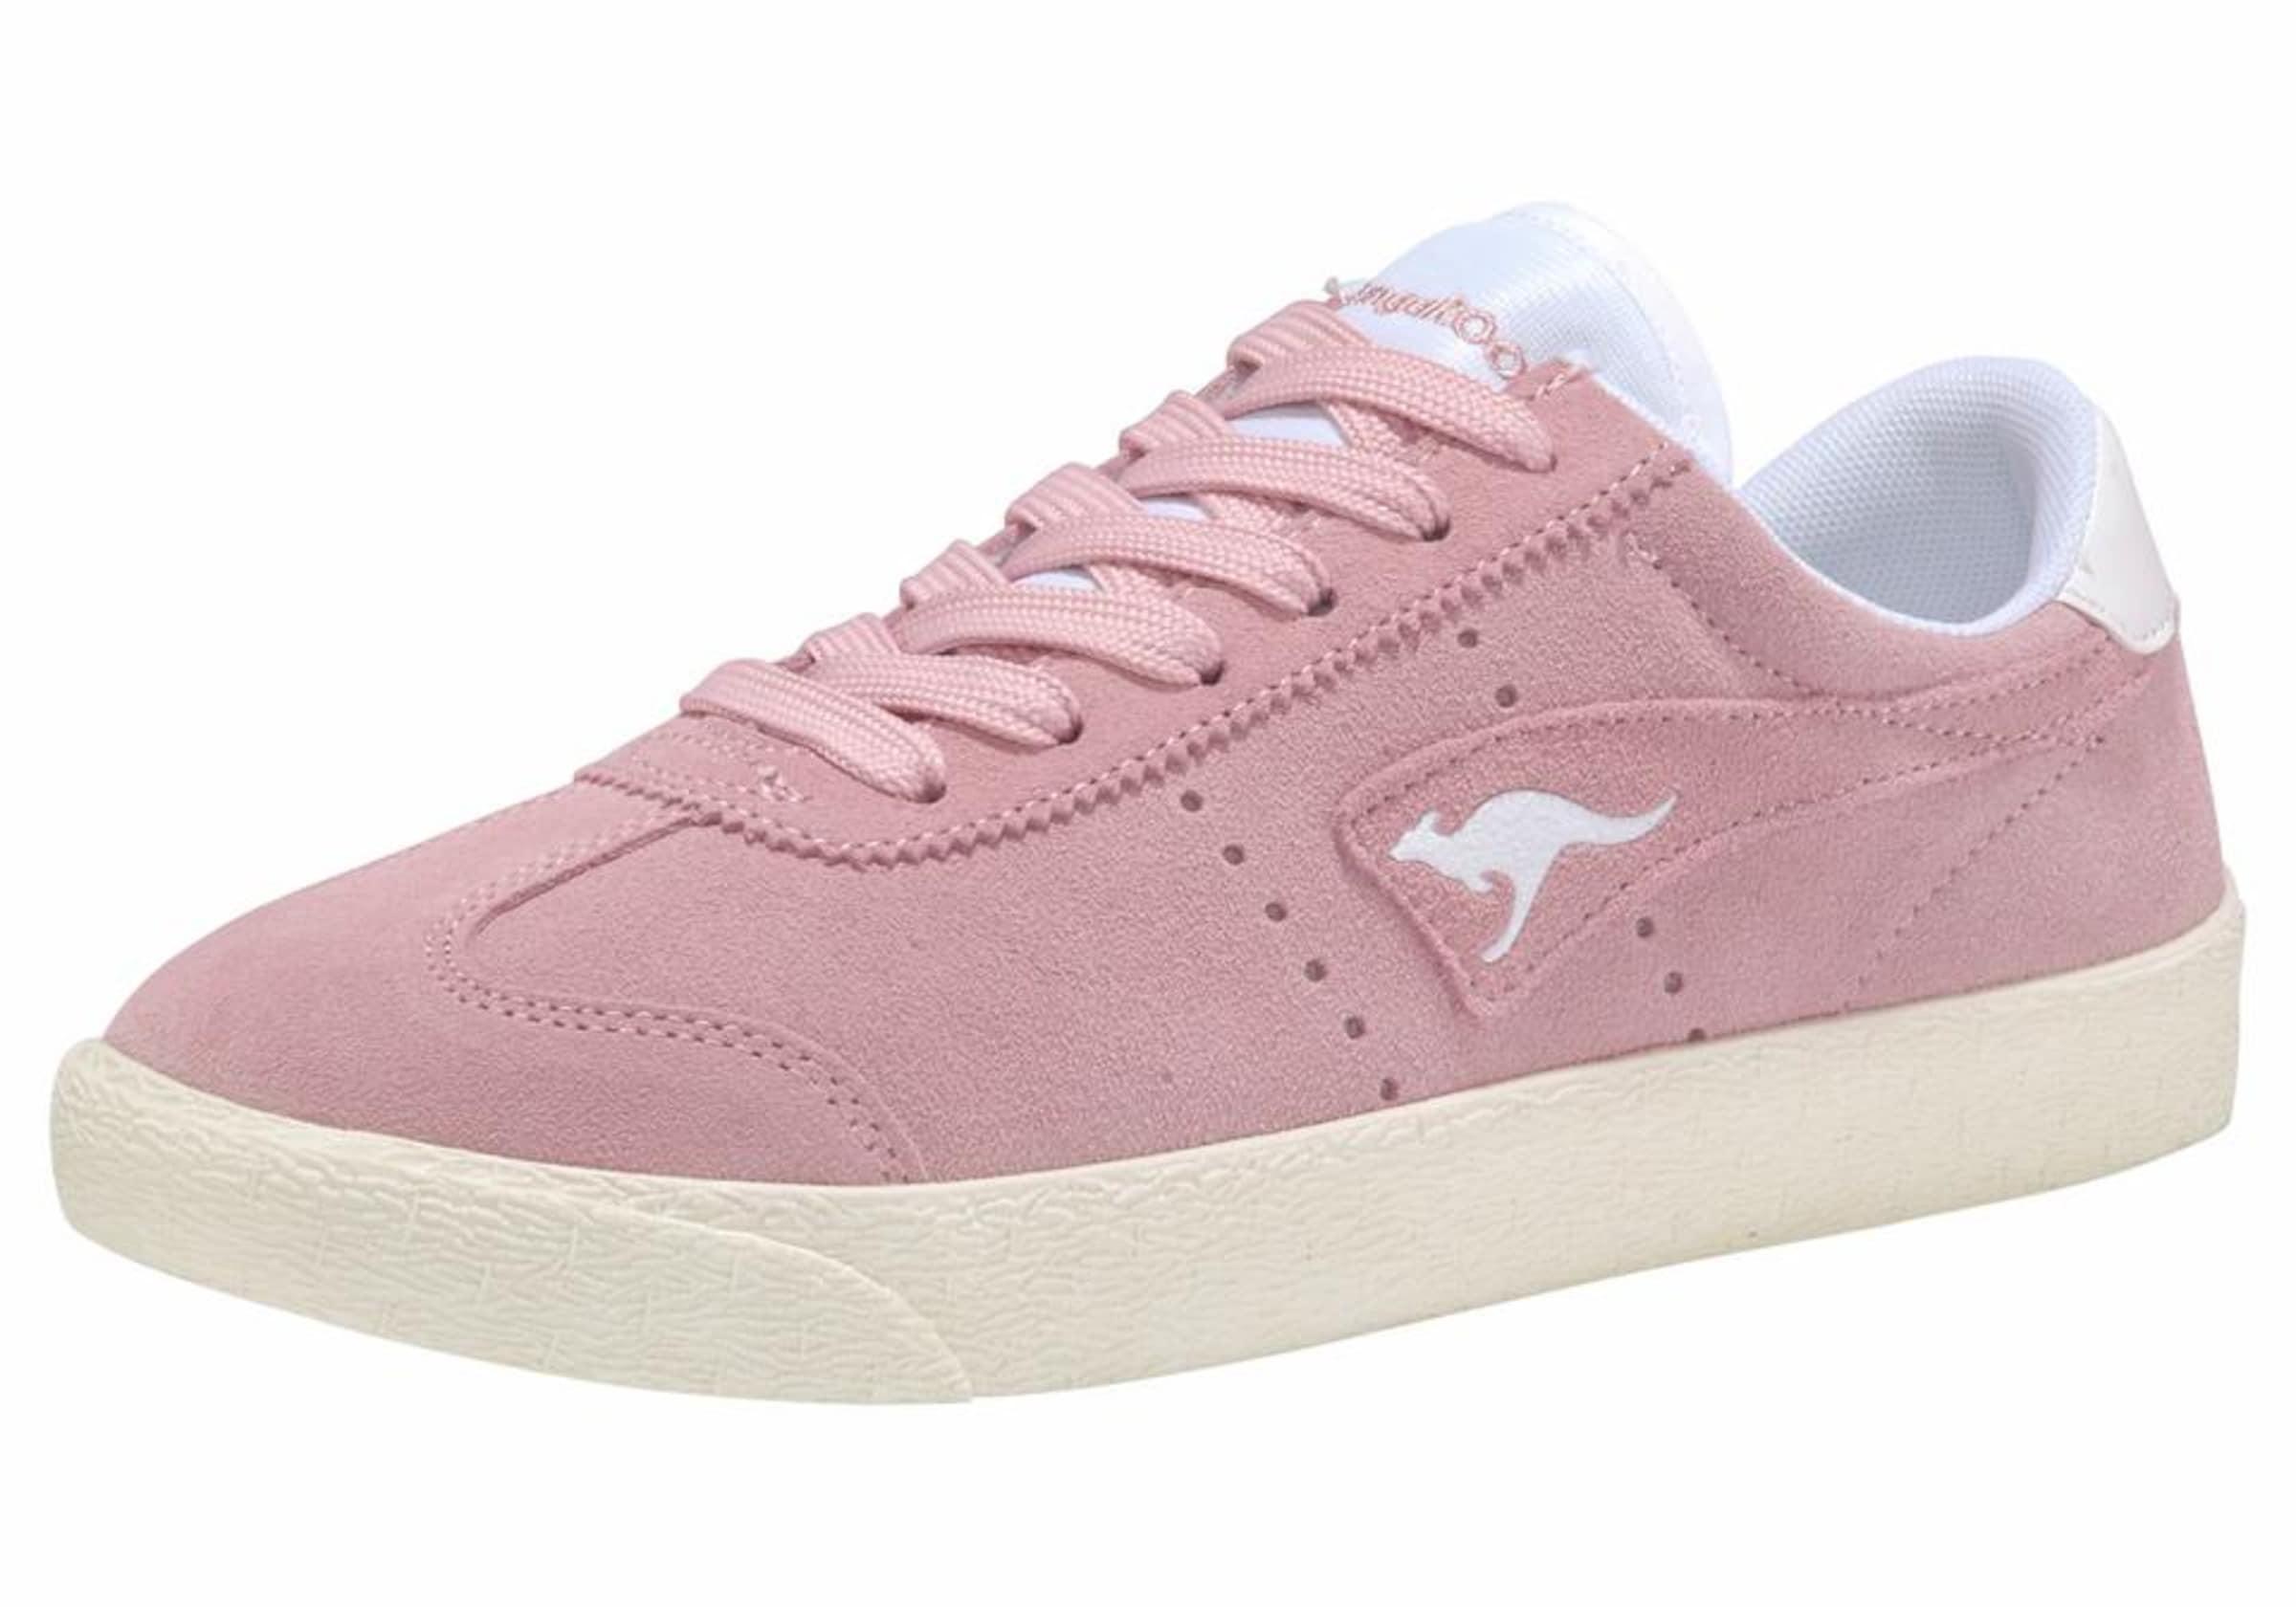 KangaROOS Sneaker Chako Verschleißfeste billige Schuhe